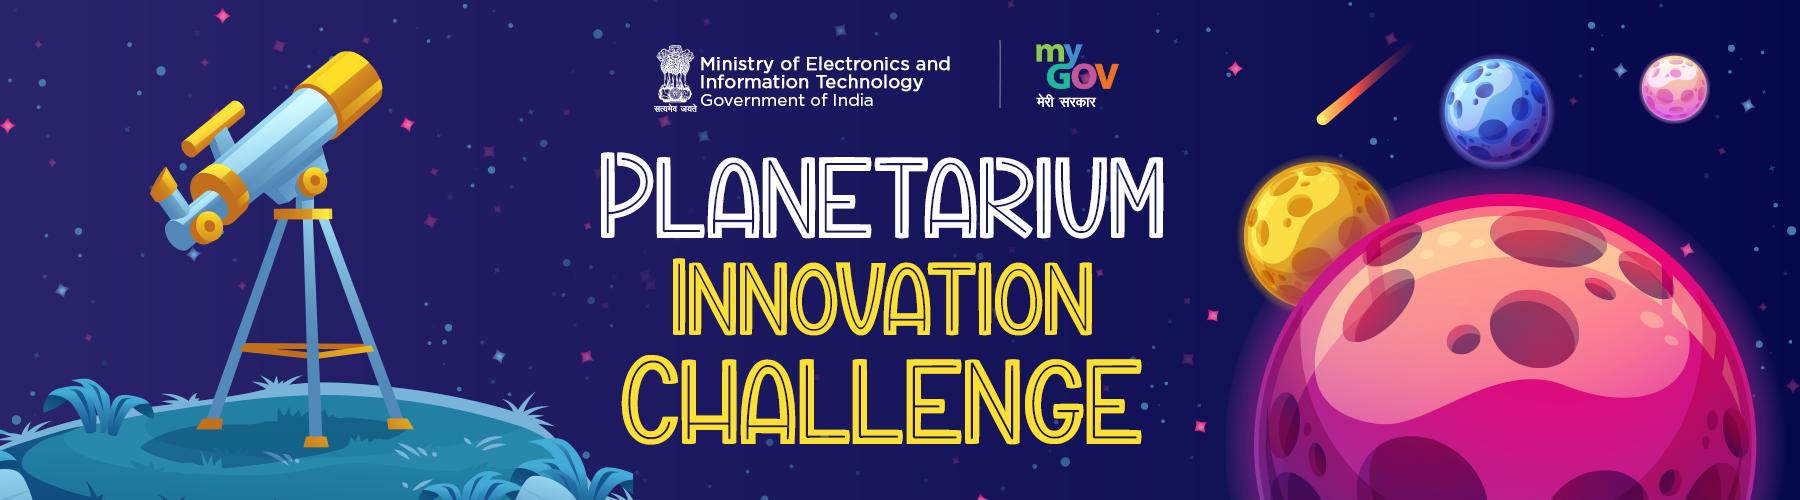 Planetarium Innovation Challenge